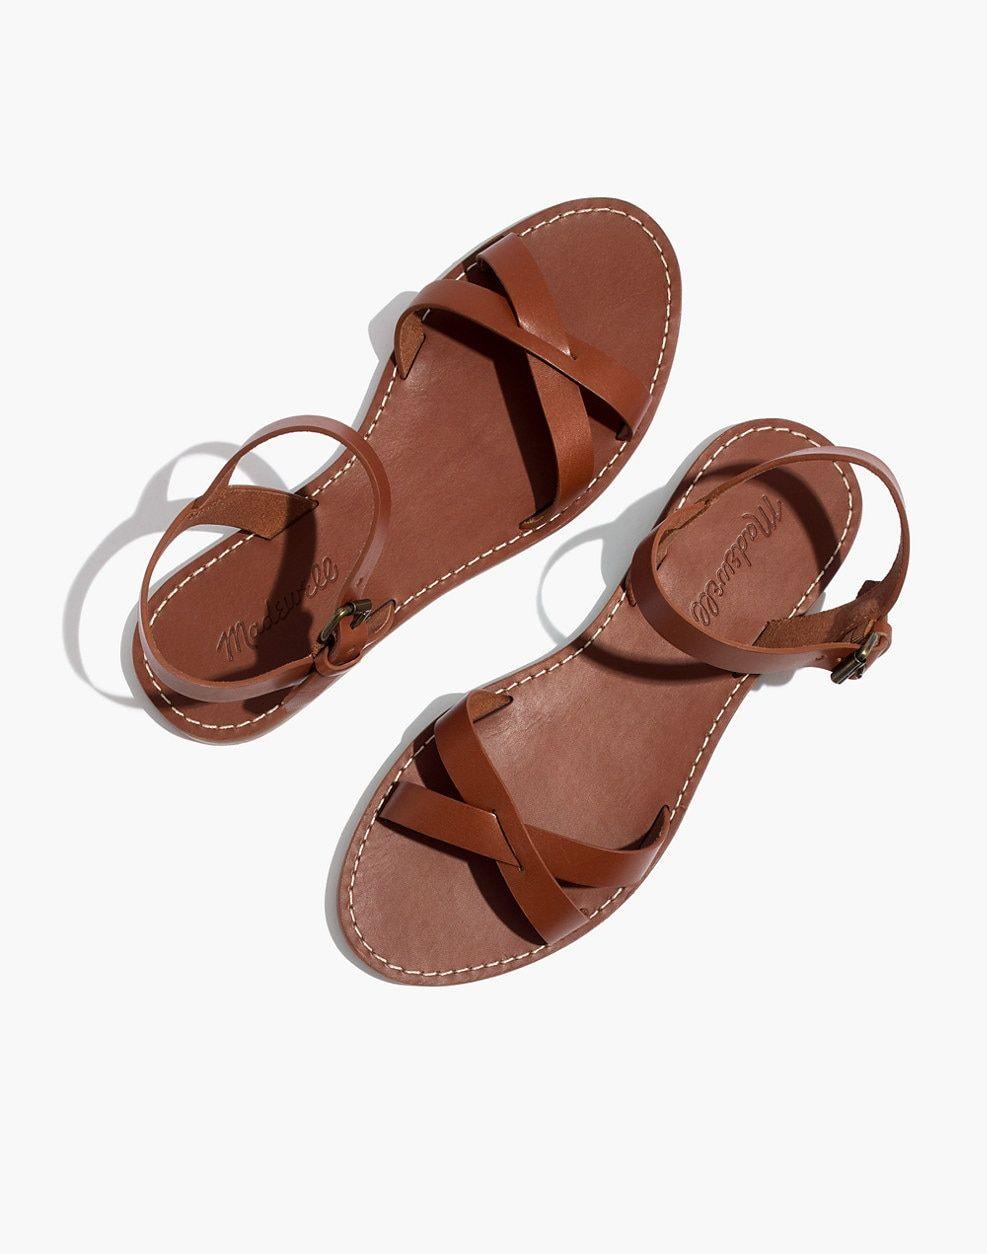 4edf43b5787d The Boardwalk Crisscross Sandal   sandals